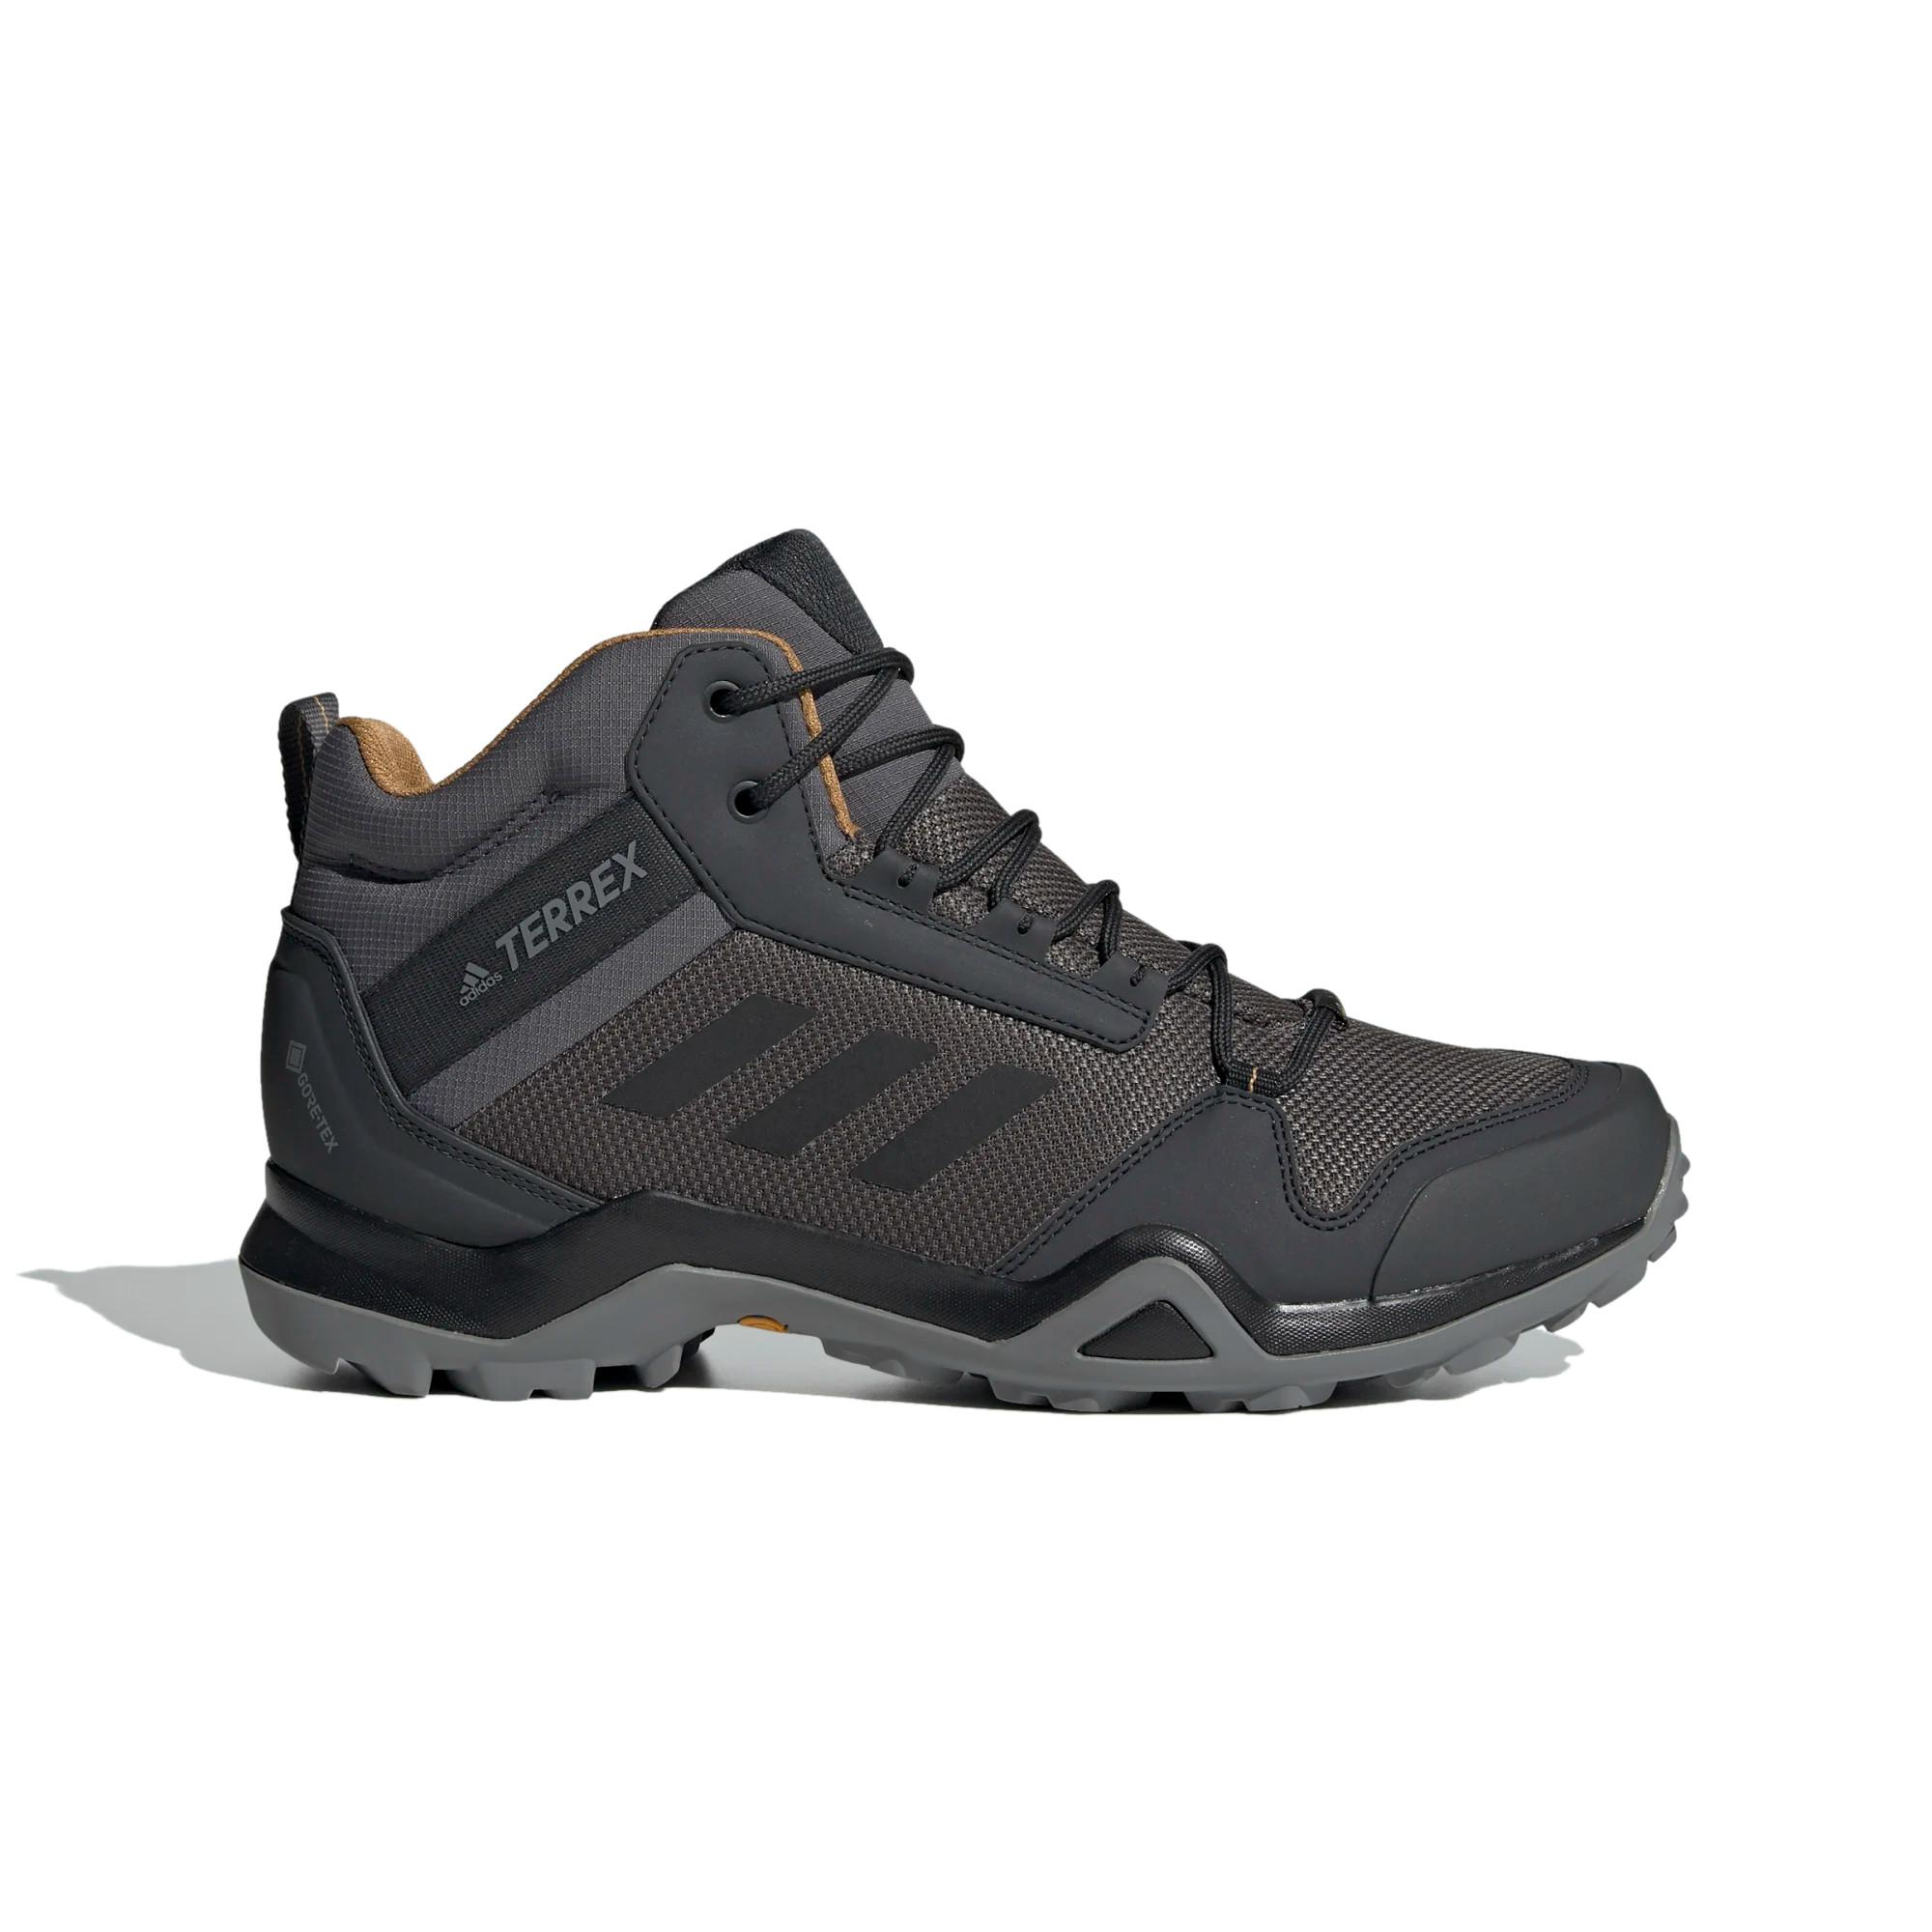 Kenco Outfitters   Adidas Men's Terrex AX3 Mid GTX Shoe